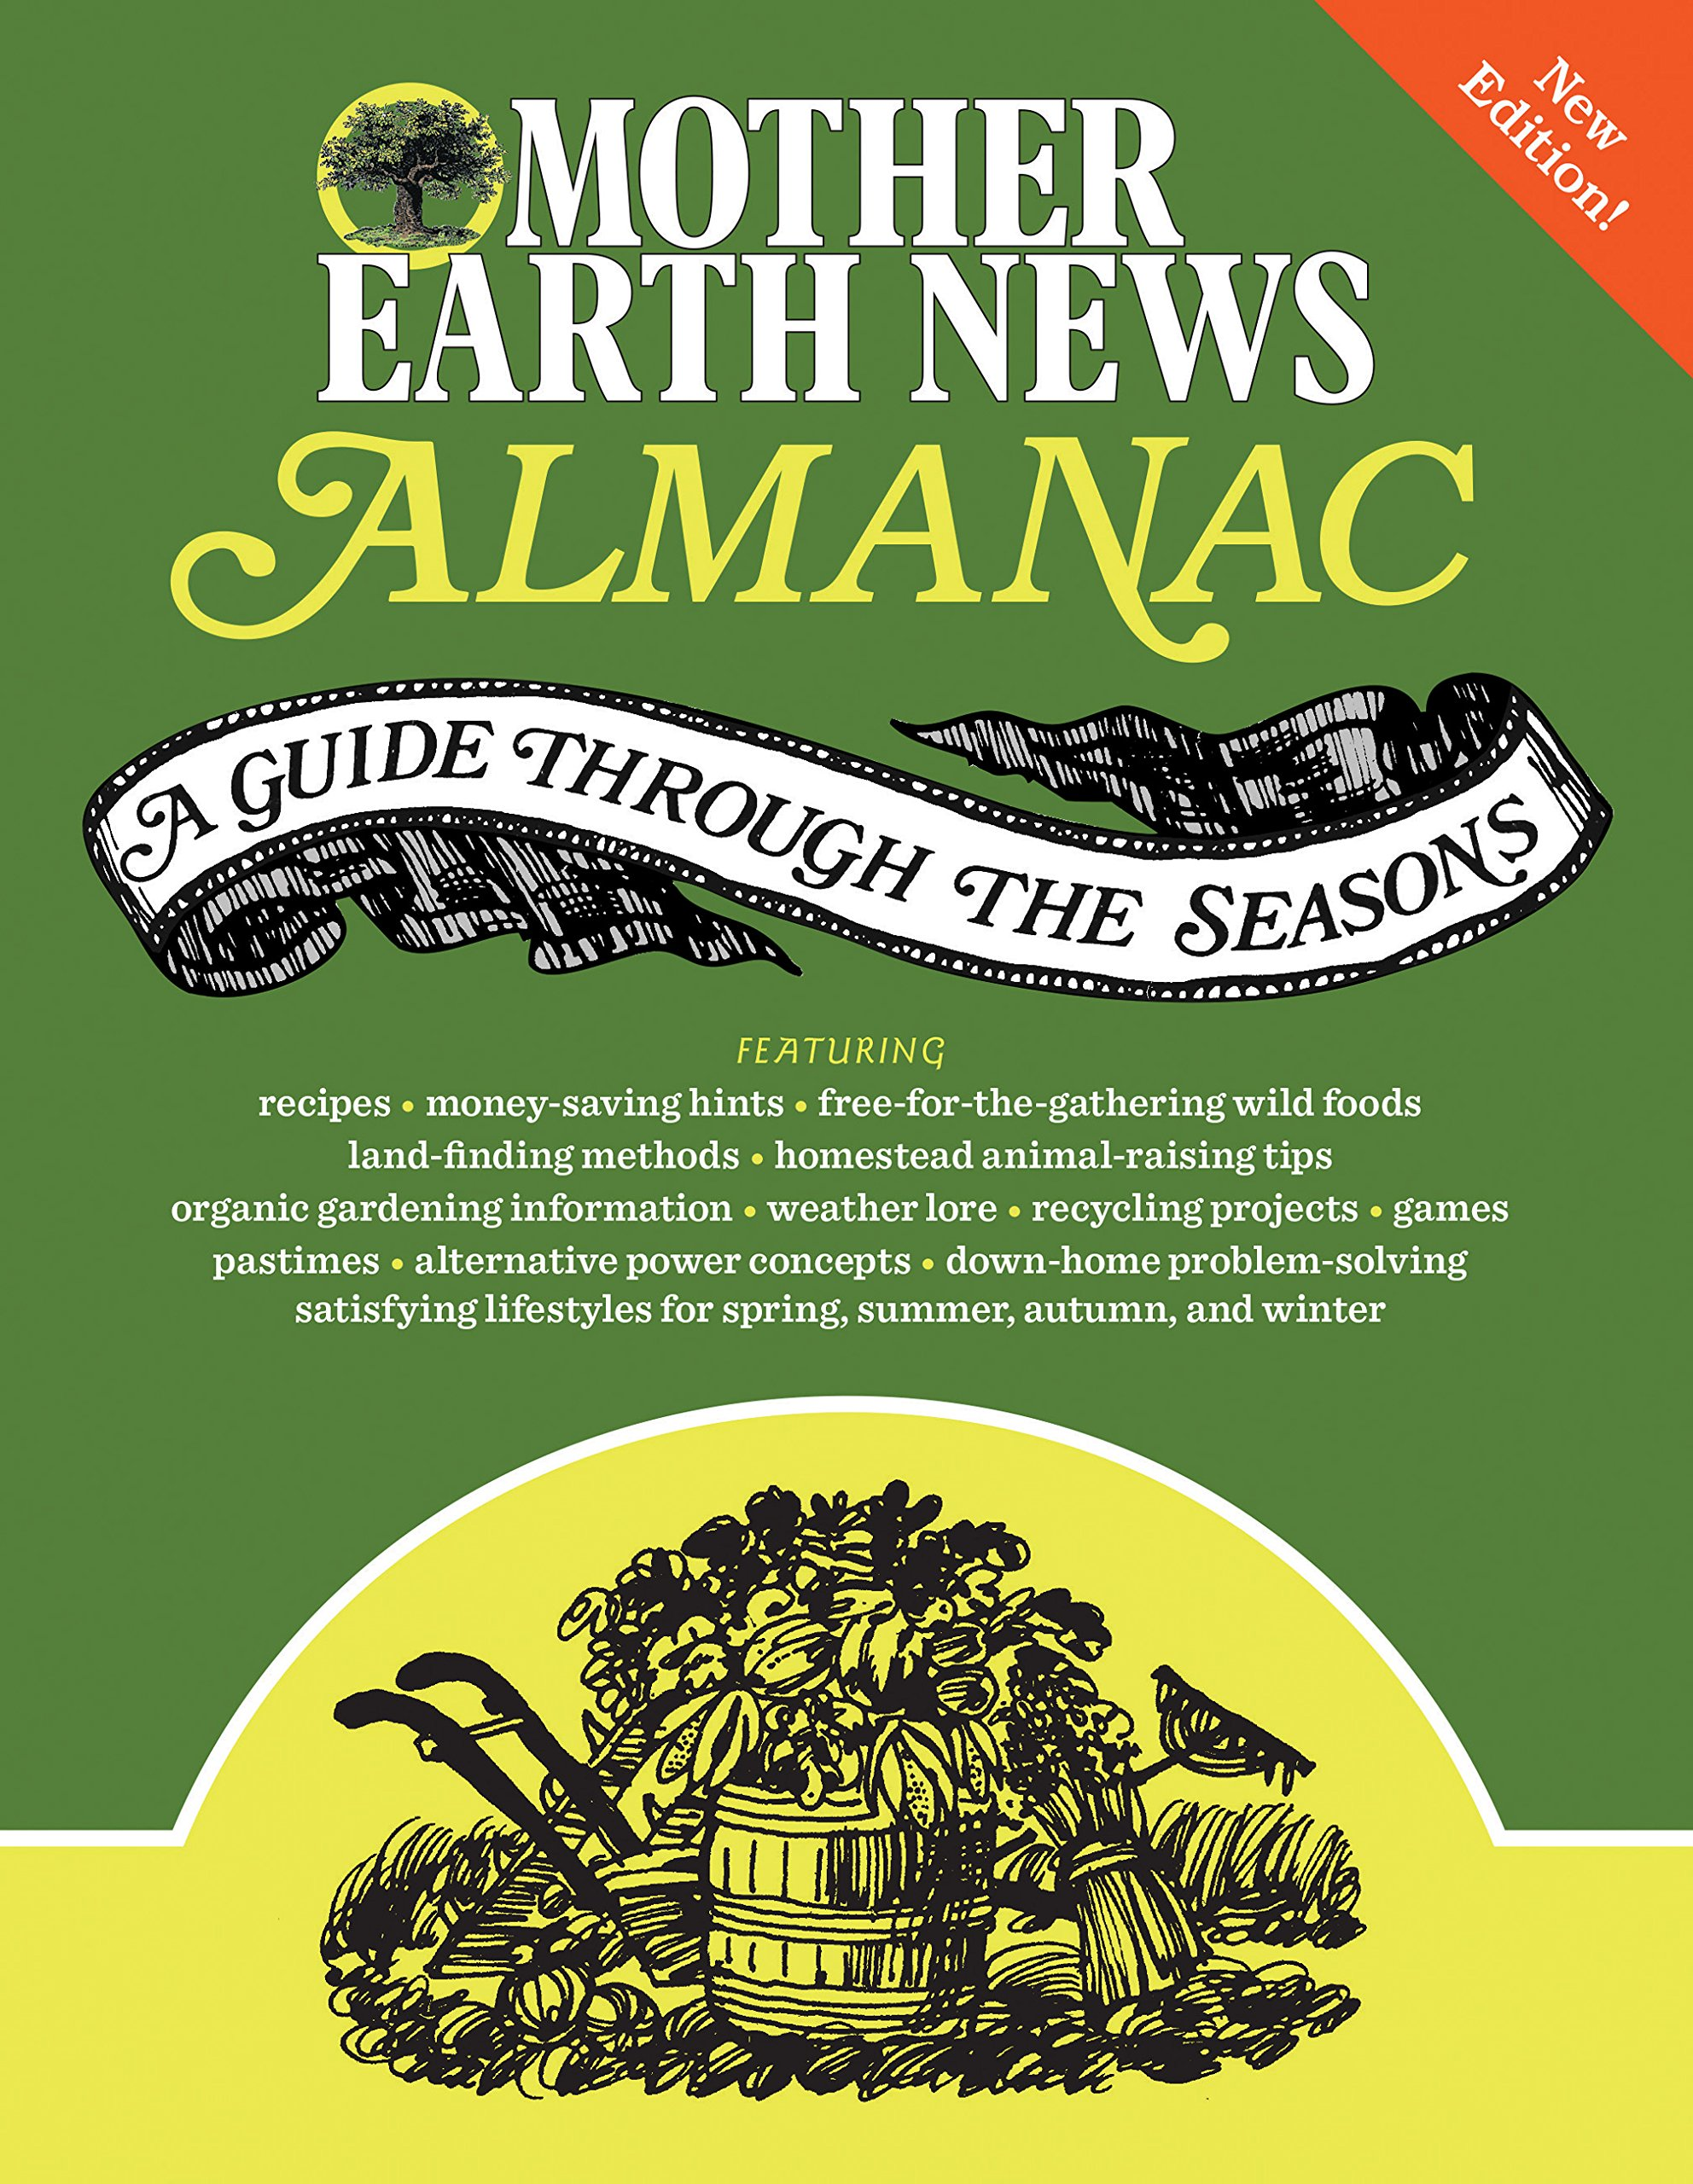 Mother Earth News Almanac: A Guide Through the Seasons: Mother Earth News:  9780760349854: Amazon.com: Books